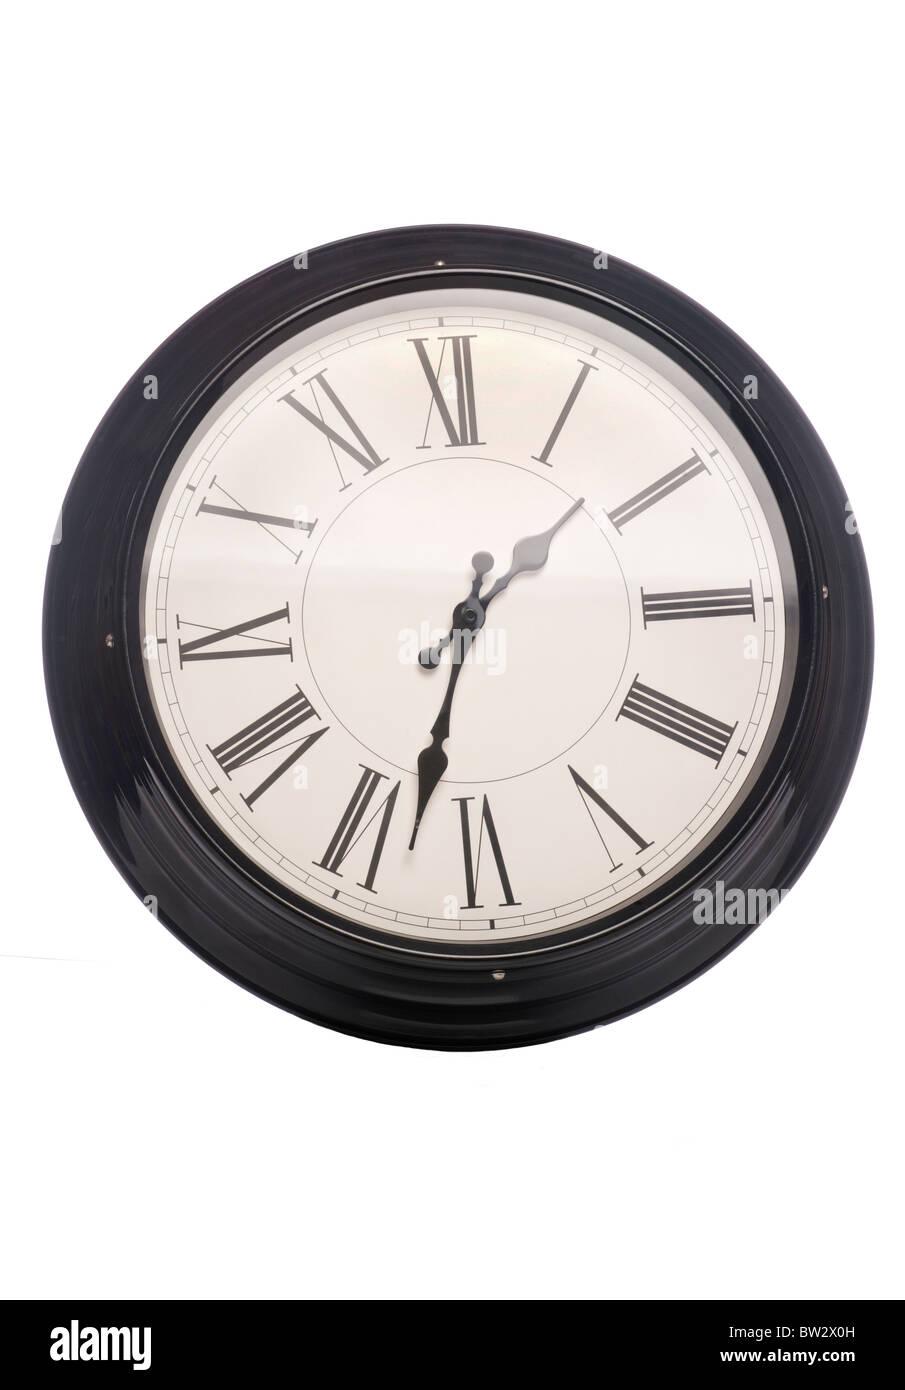 Vintage wall clock studio cutout - Stock Image